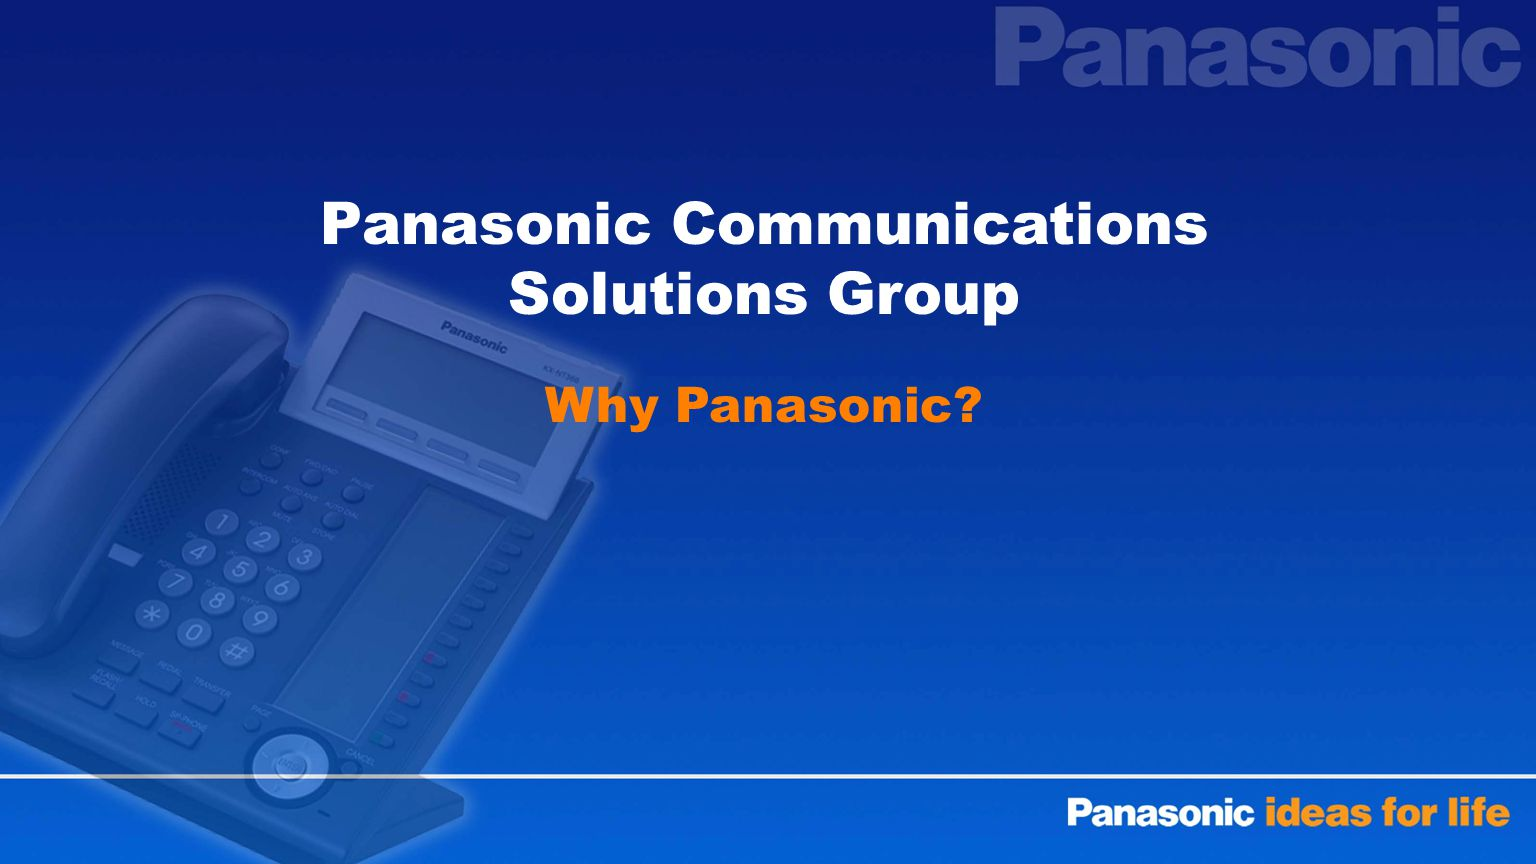 Panasonic Communications Solutions Group Why Panasonic?